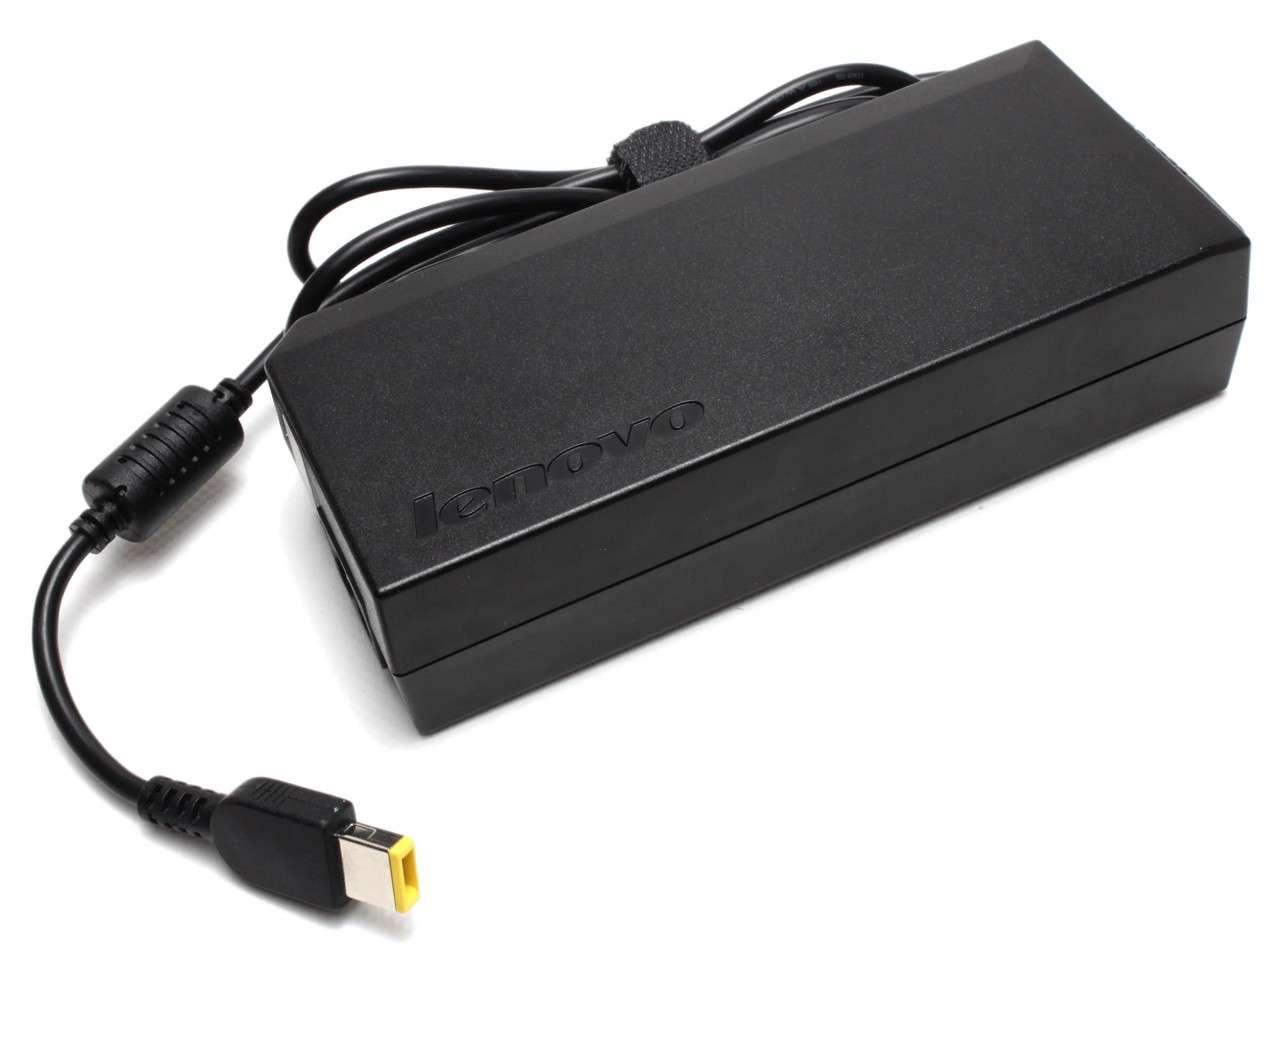 Incarcator Lenovo IdeaPad Y70 135W ORIGINAL imagine